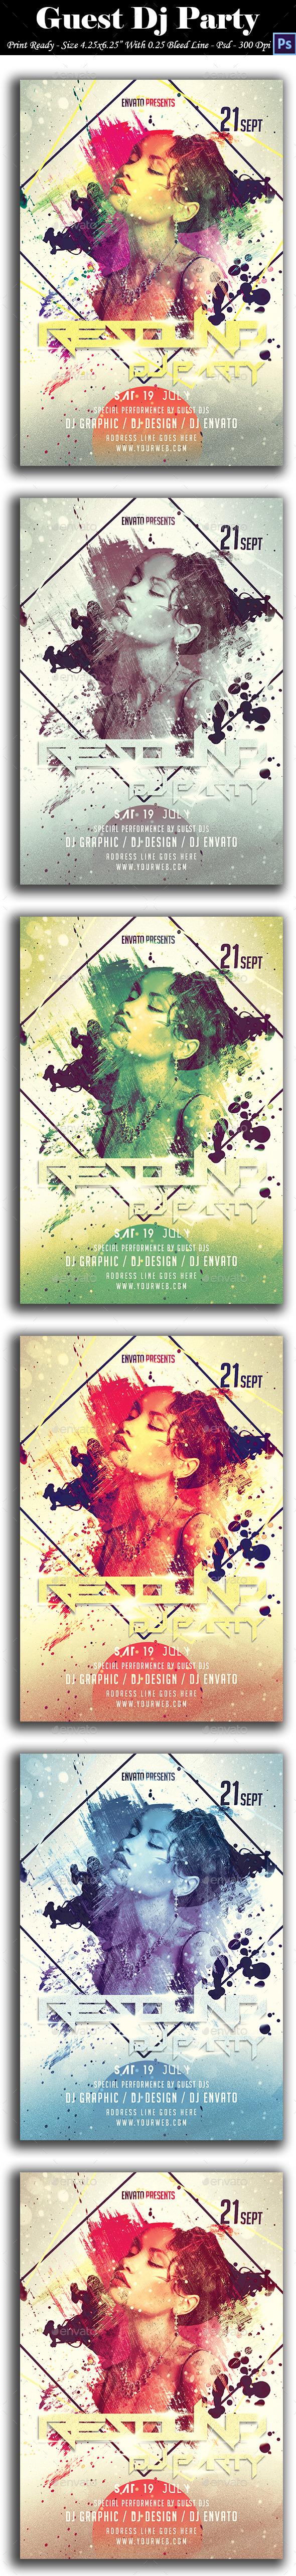 GraphicRiver Guest Dj Party Flyer 8902232